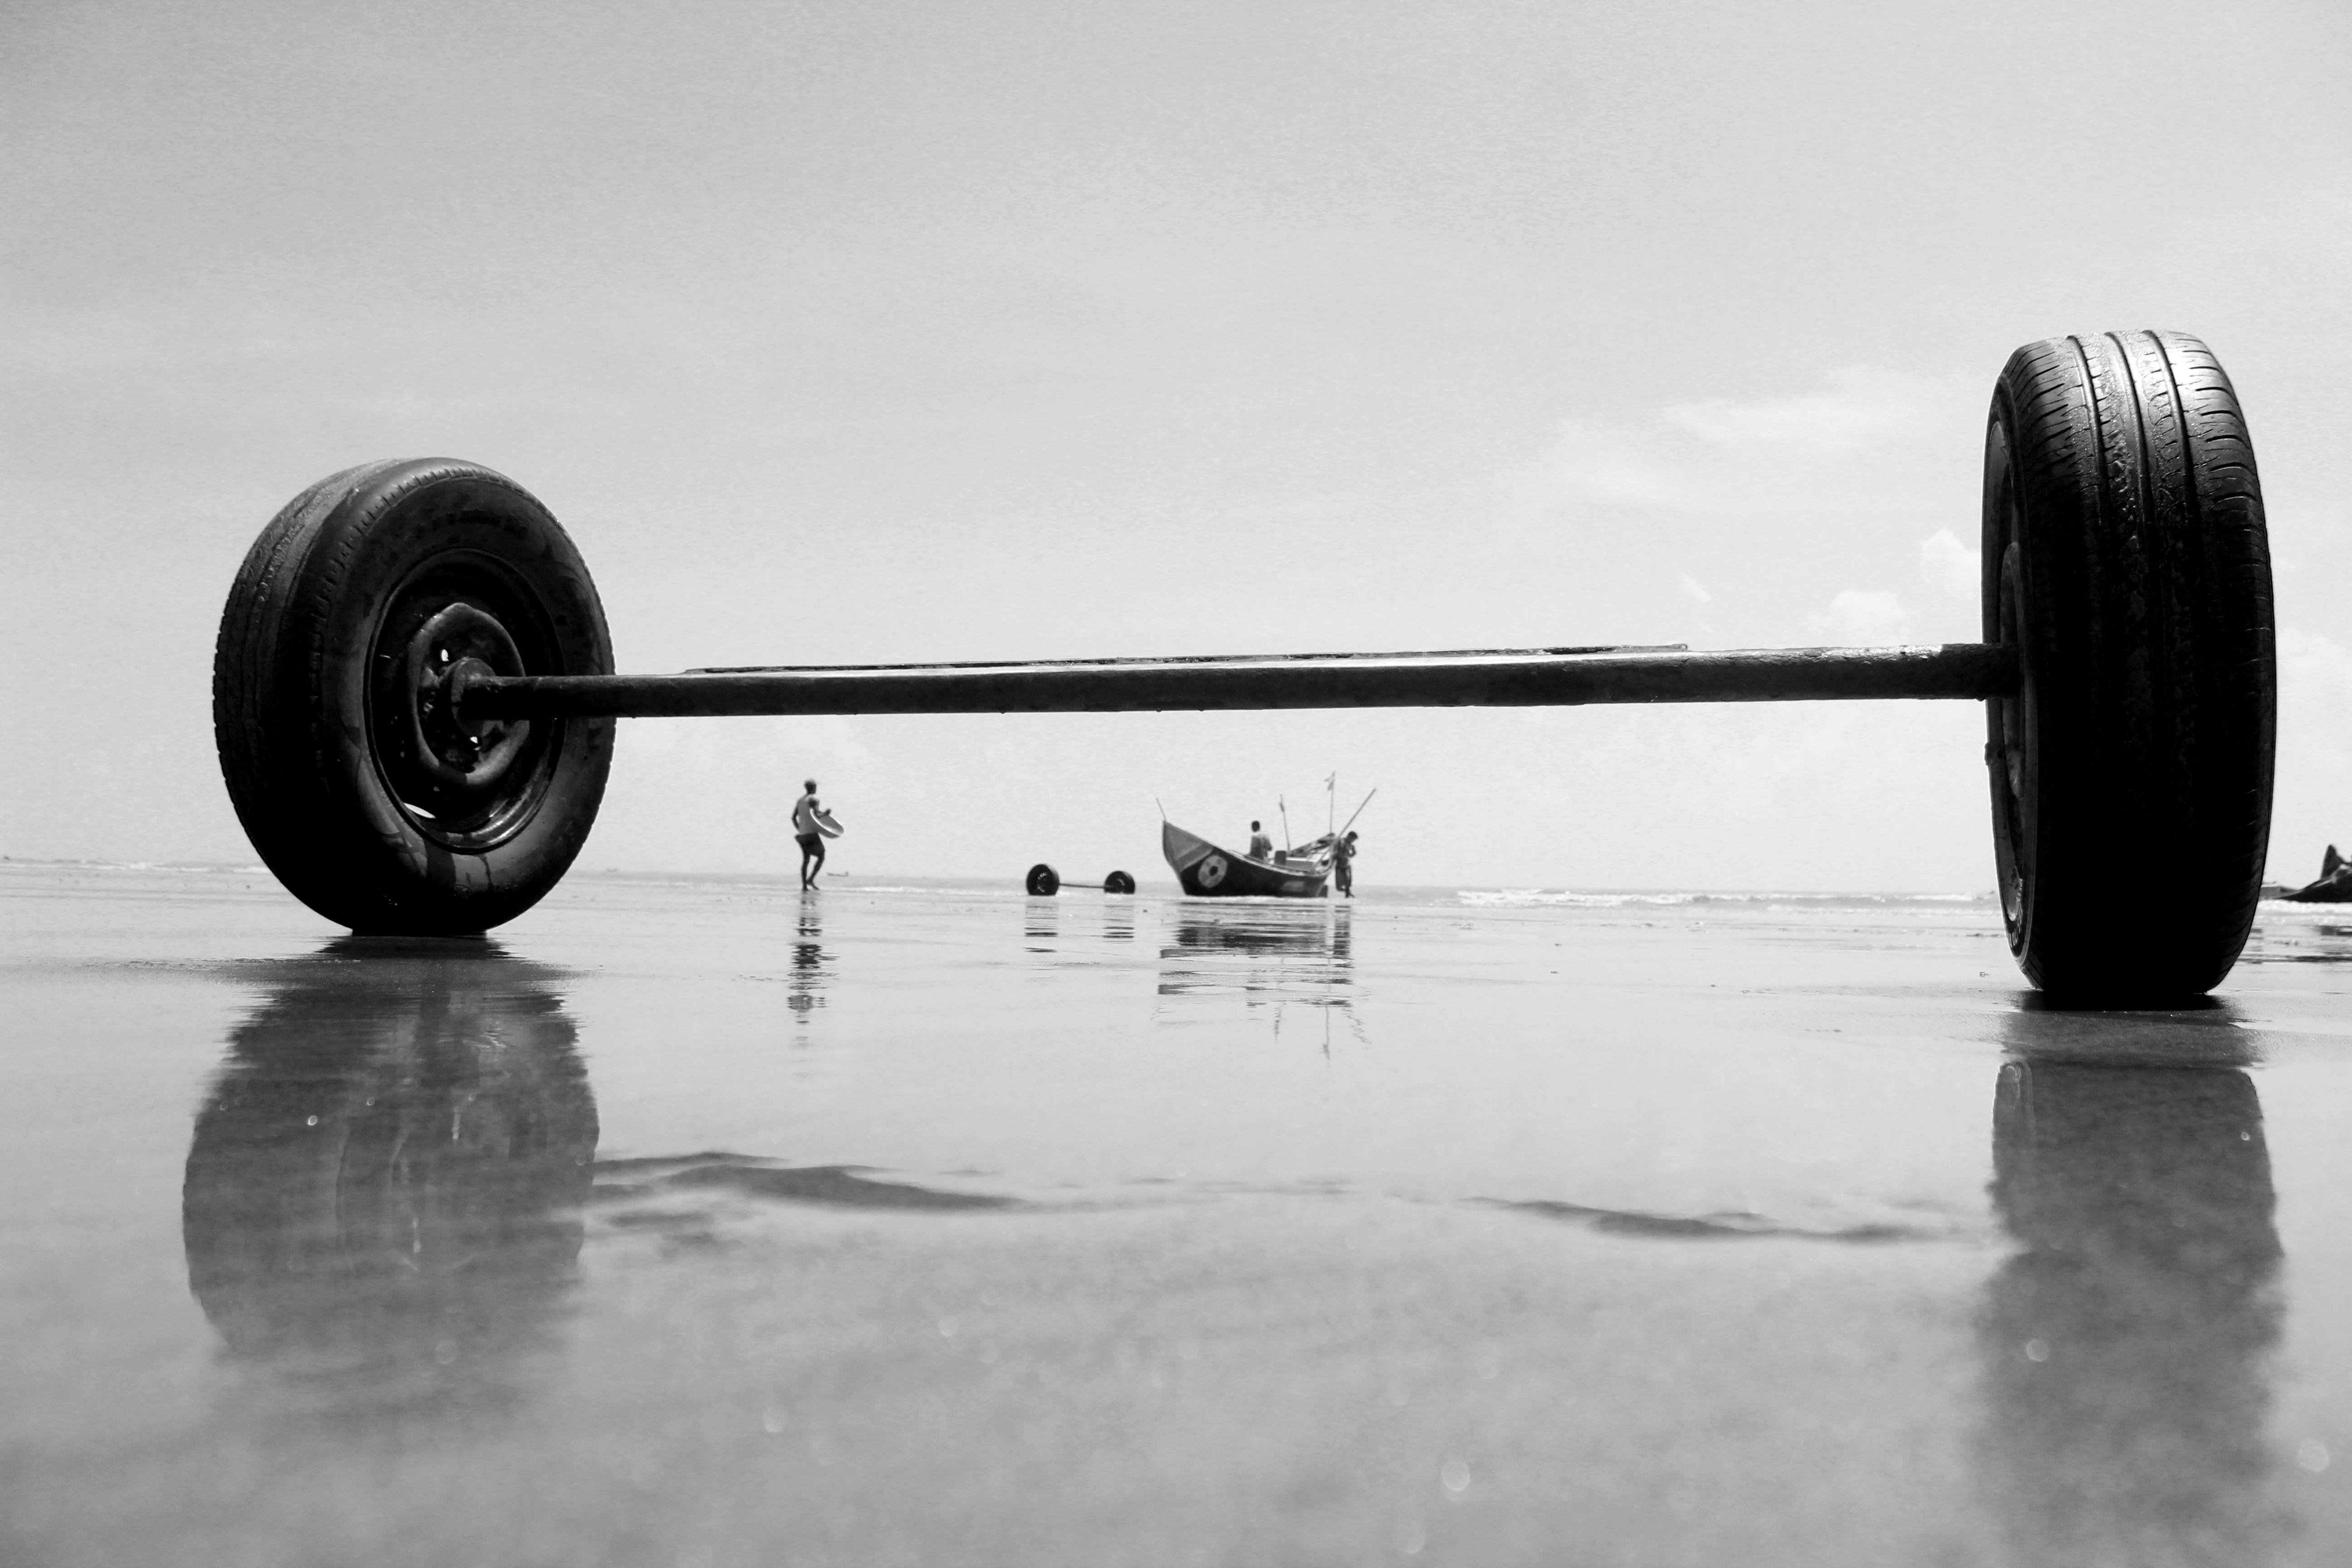 Fishermen are preparing to fish in the sea of Bangladesh